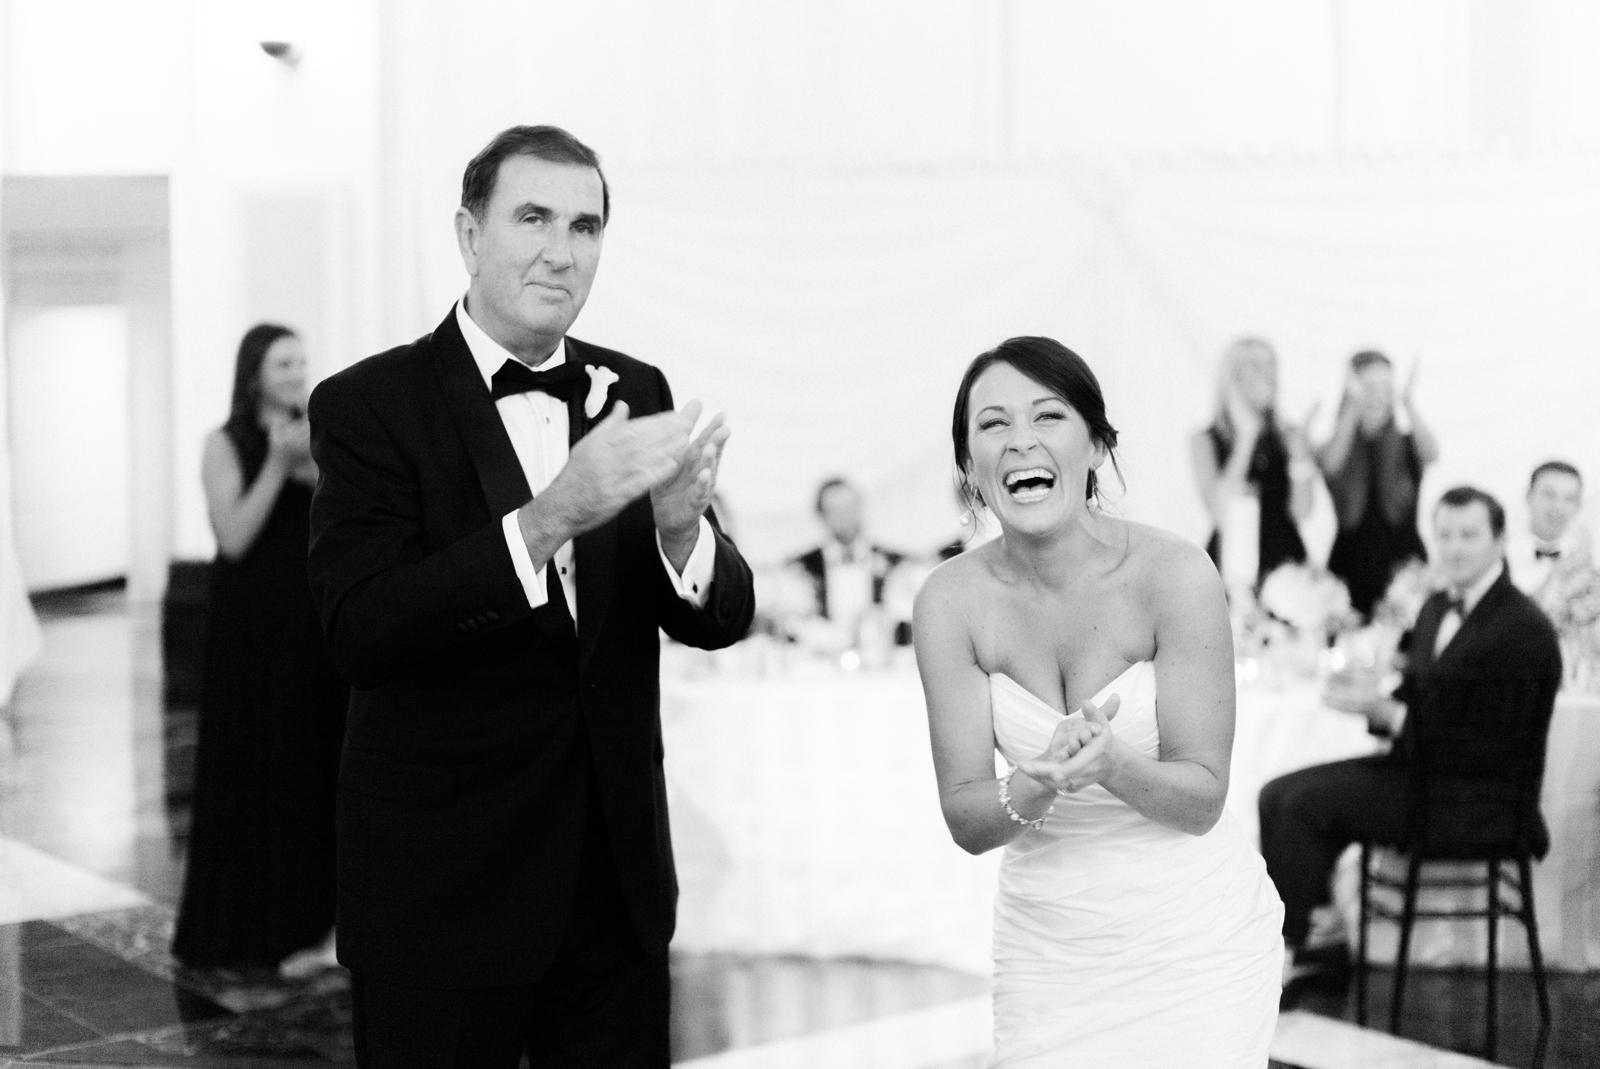 atrium at curtis center wedding photographer philadelphia wedding photographer shannon griffin_0033.jpg